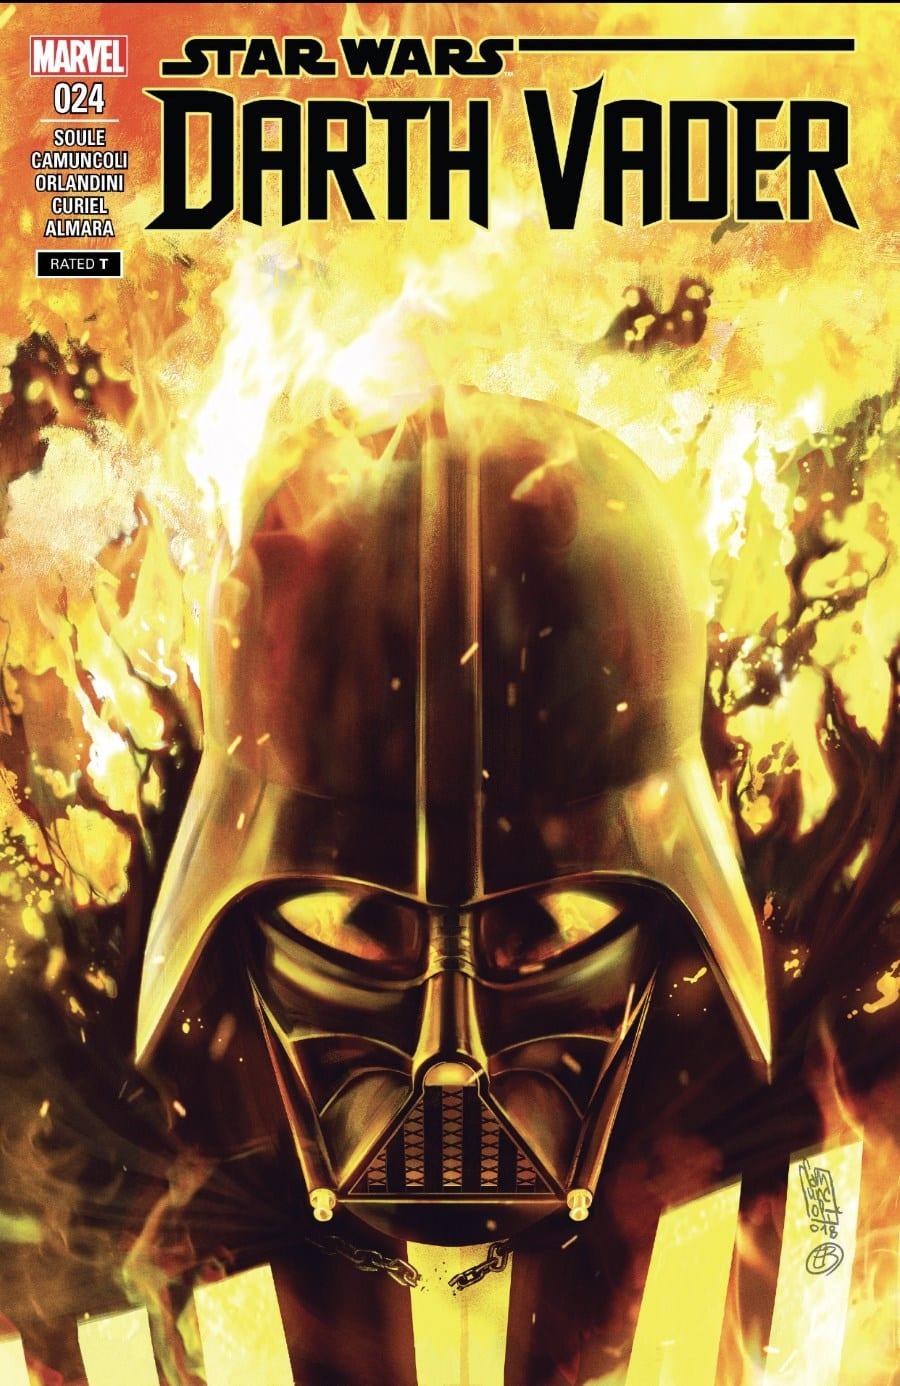 Darth Vader #24 - Fortress Vader Part VI - Cover